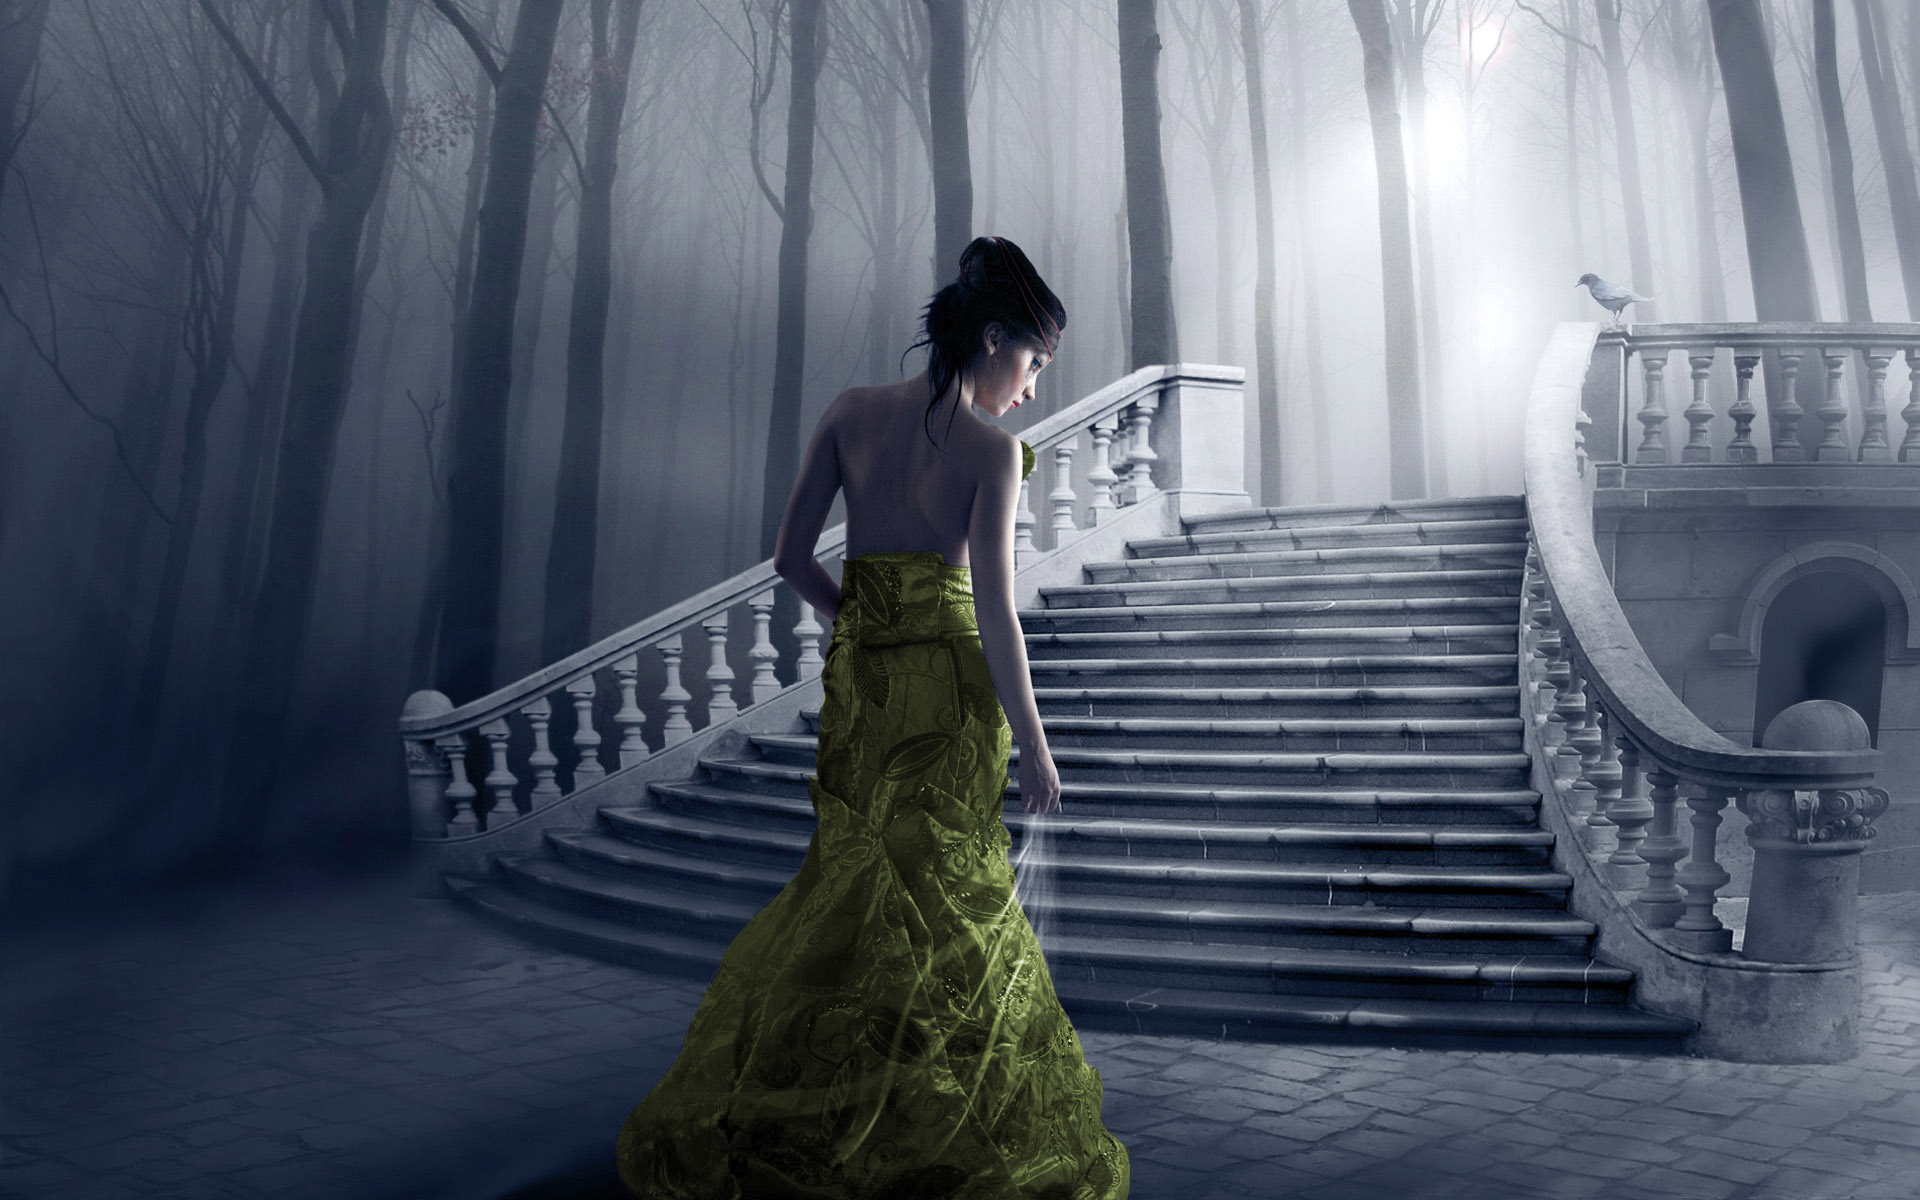 Women - Gothic  Wallpaper